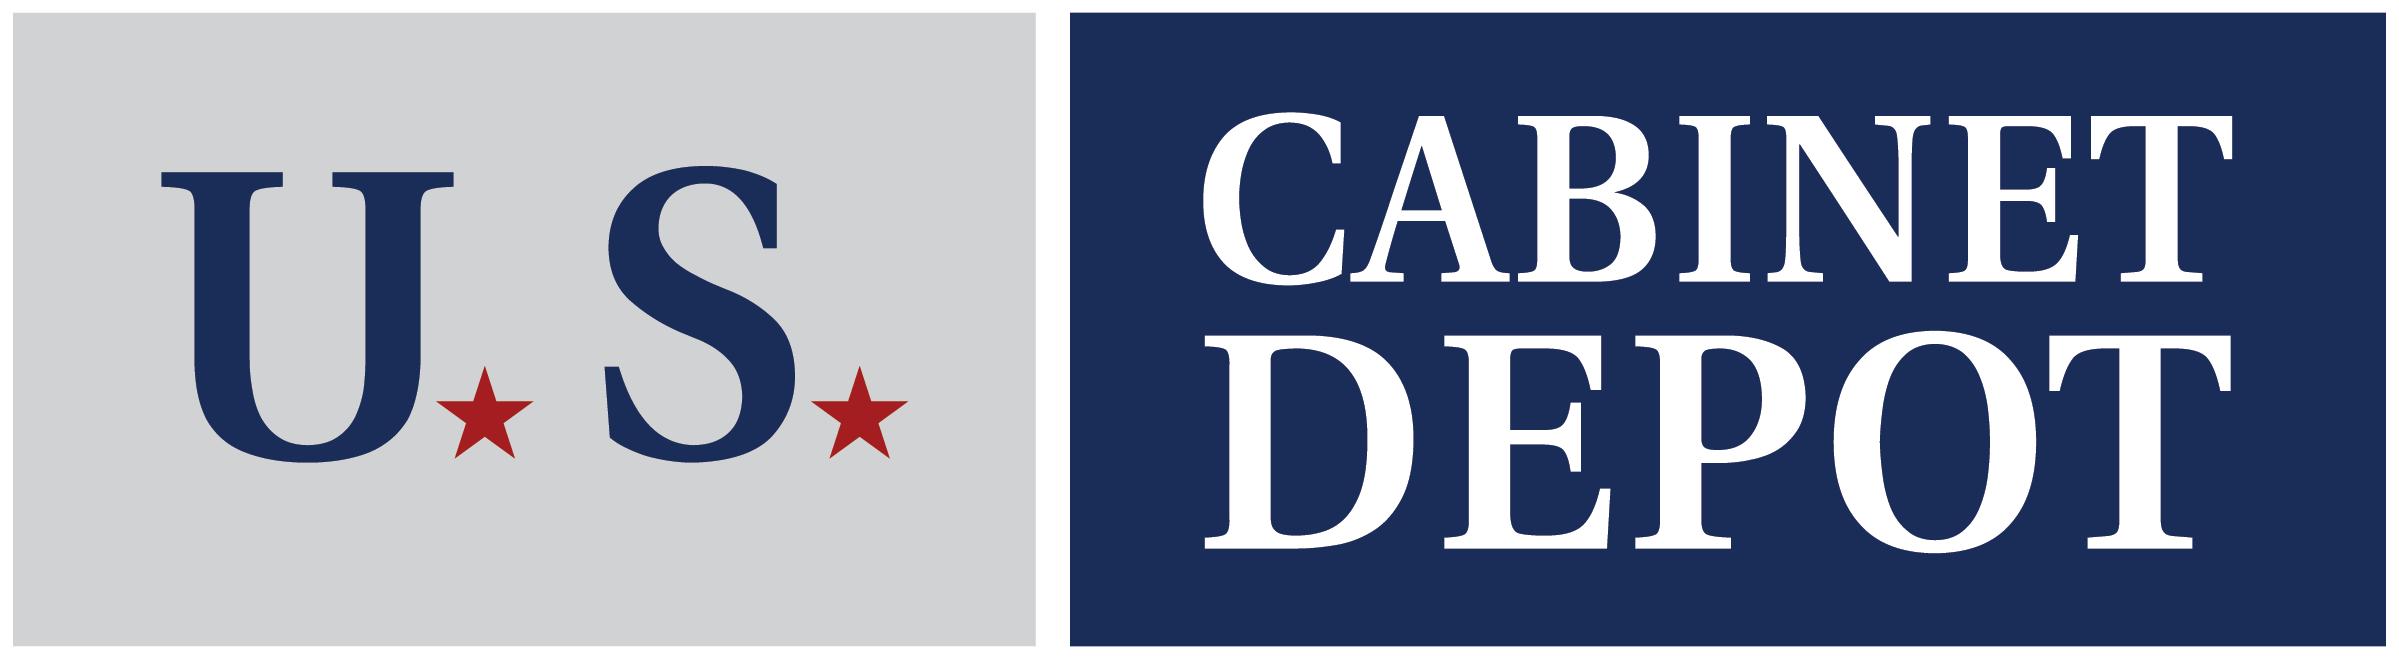 U s cabinet depot consumer goods services